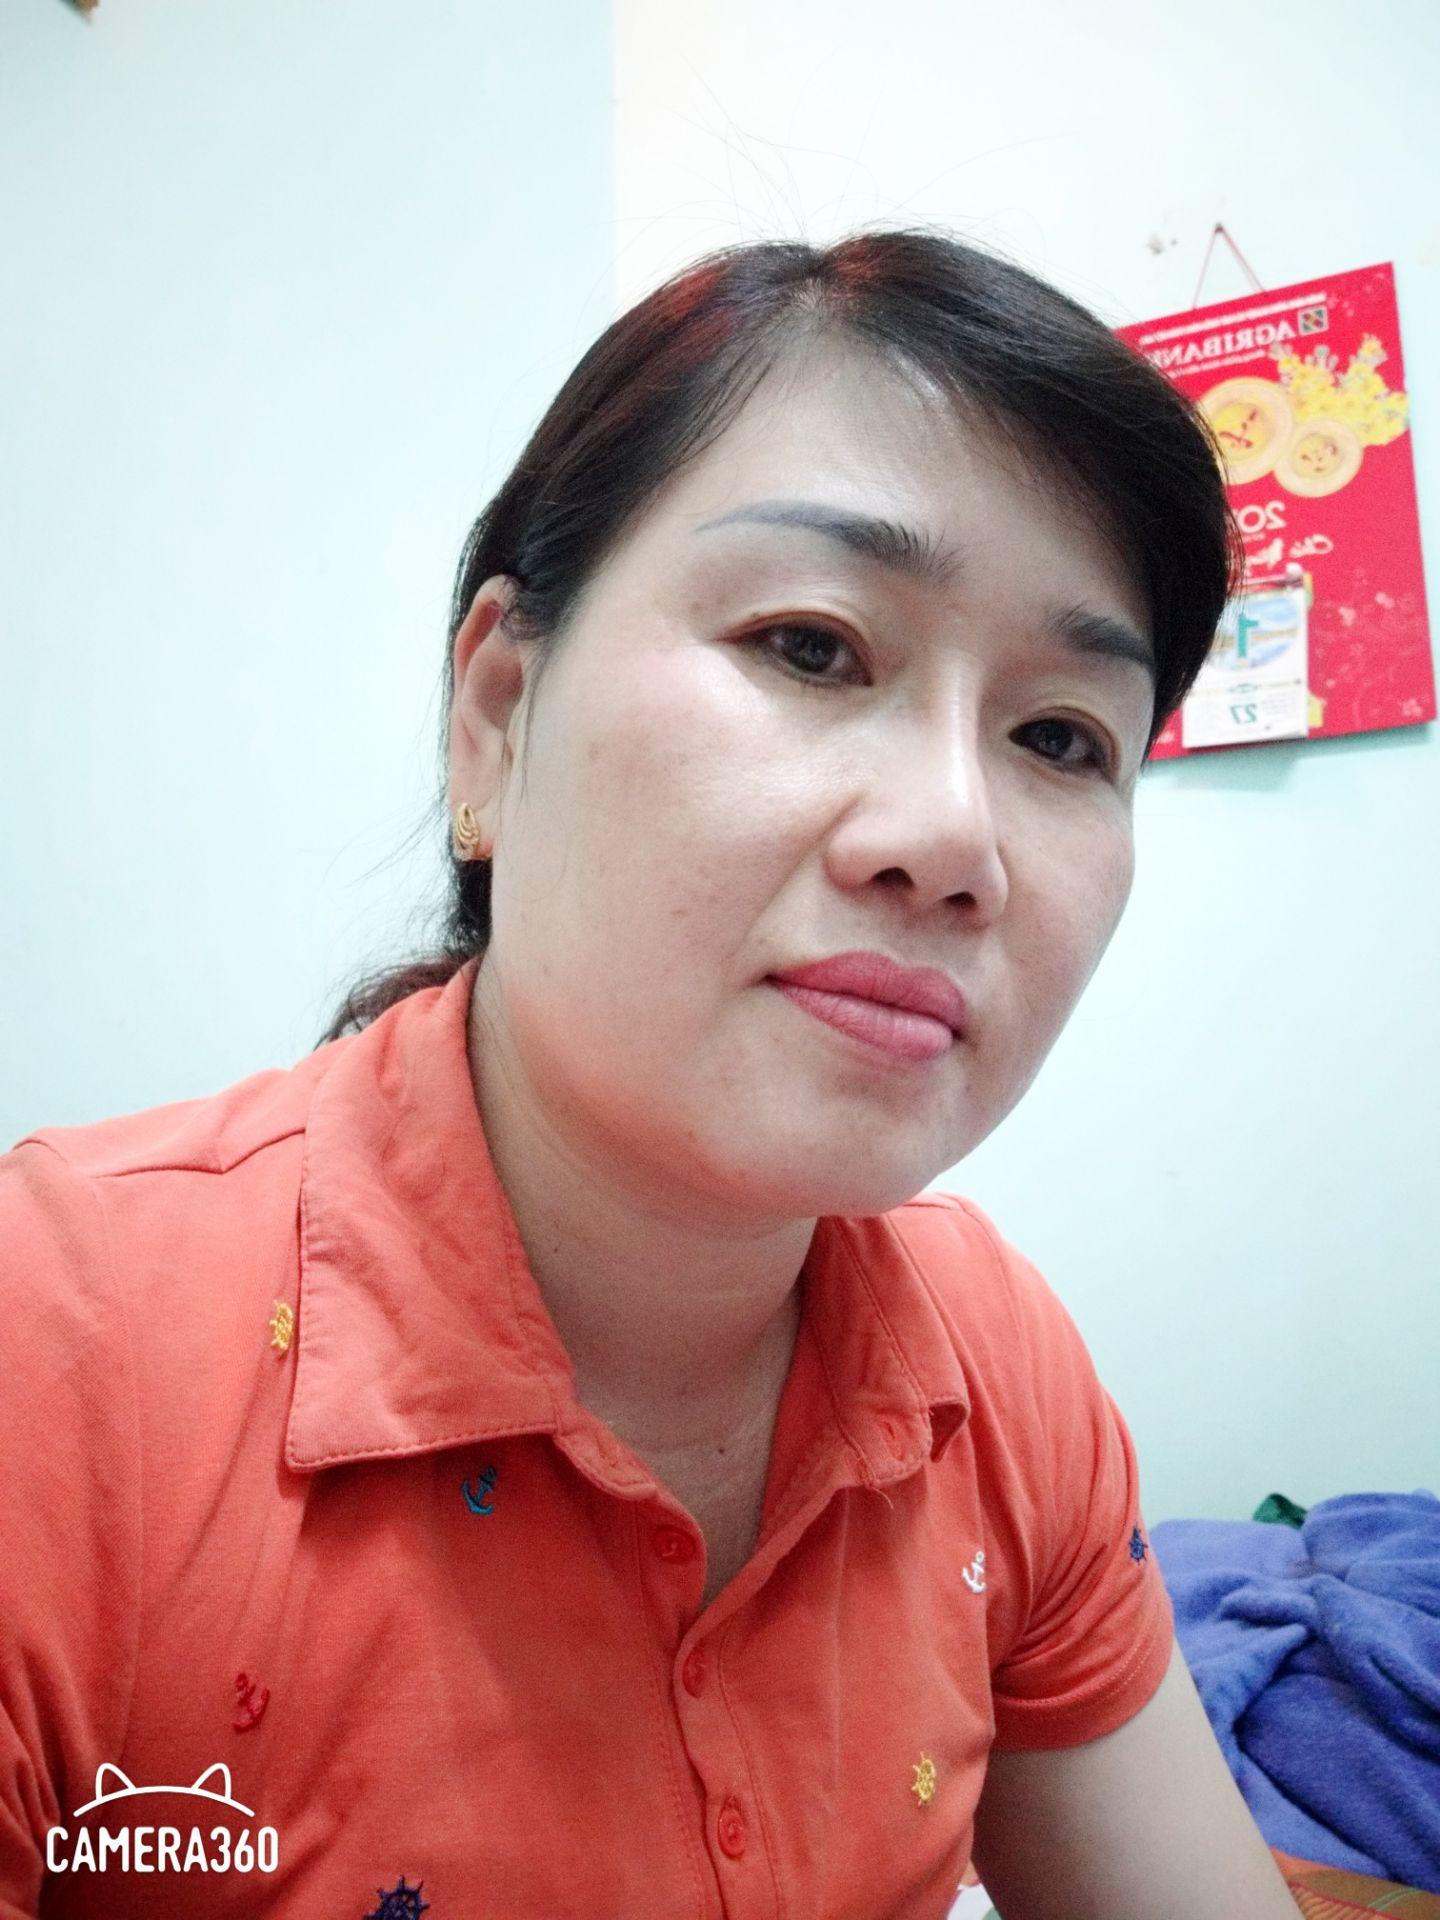 thuc-pham-bao-ve-suc-khoe-diep-luc-collagen-green-collagen-powder-p6293541-review-9